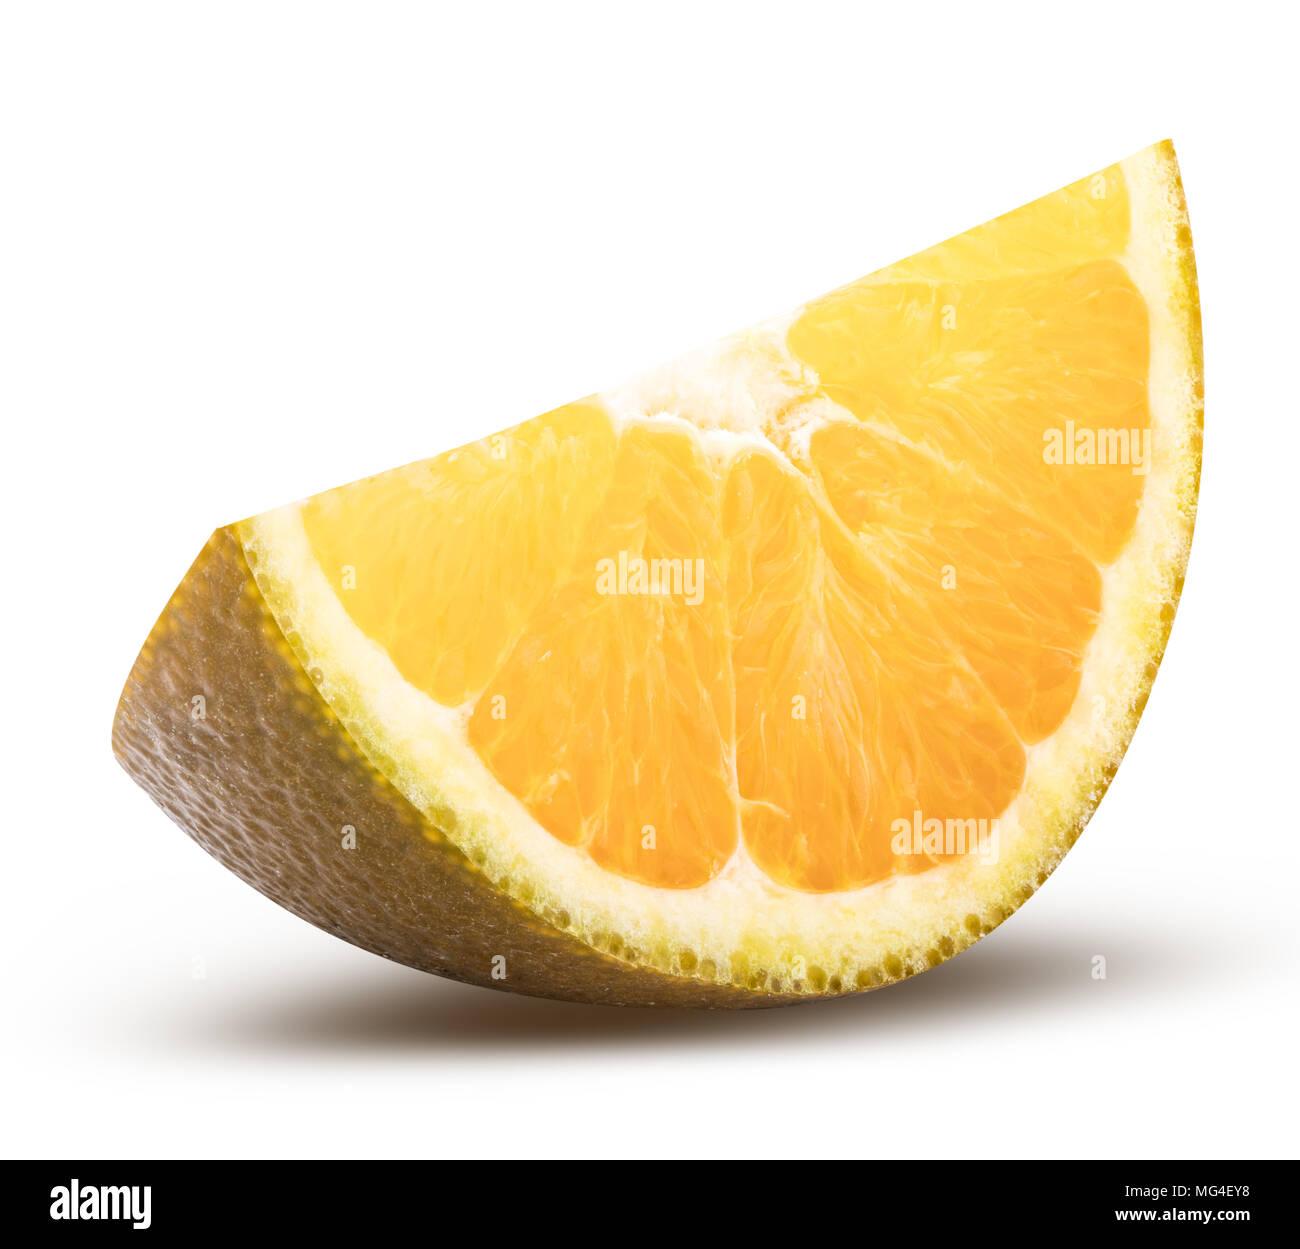 Fresh blood dark orange isolated on white background with clipping path - Stock Image